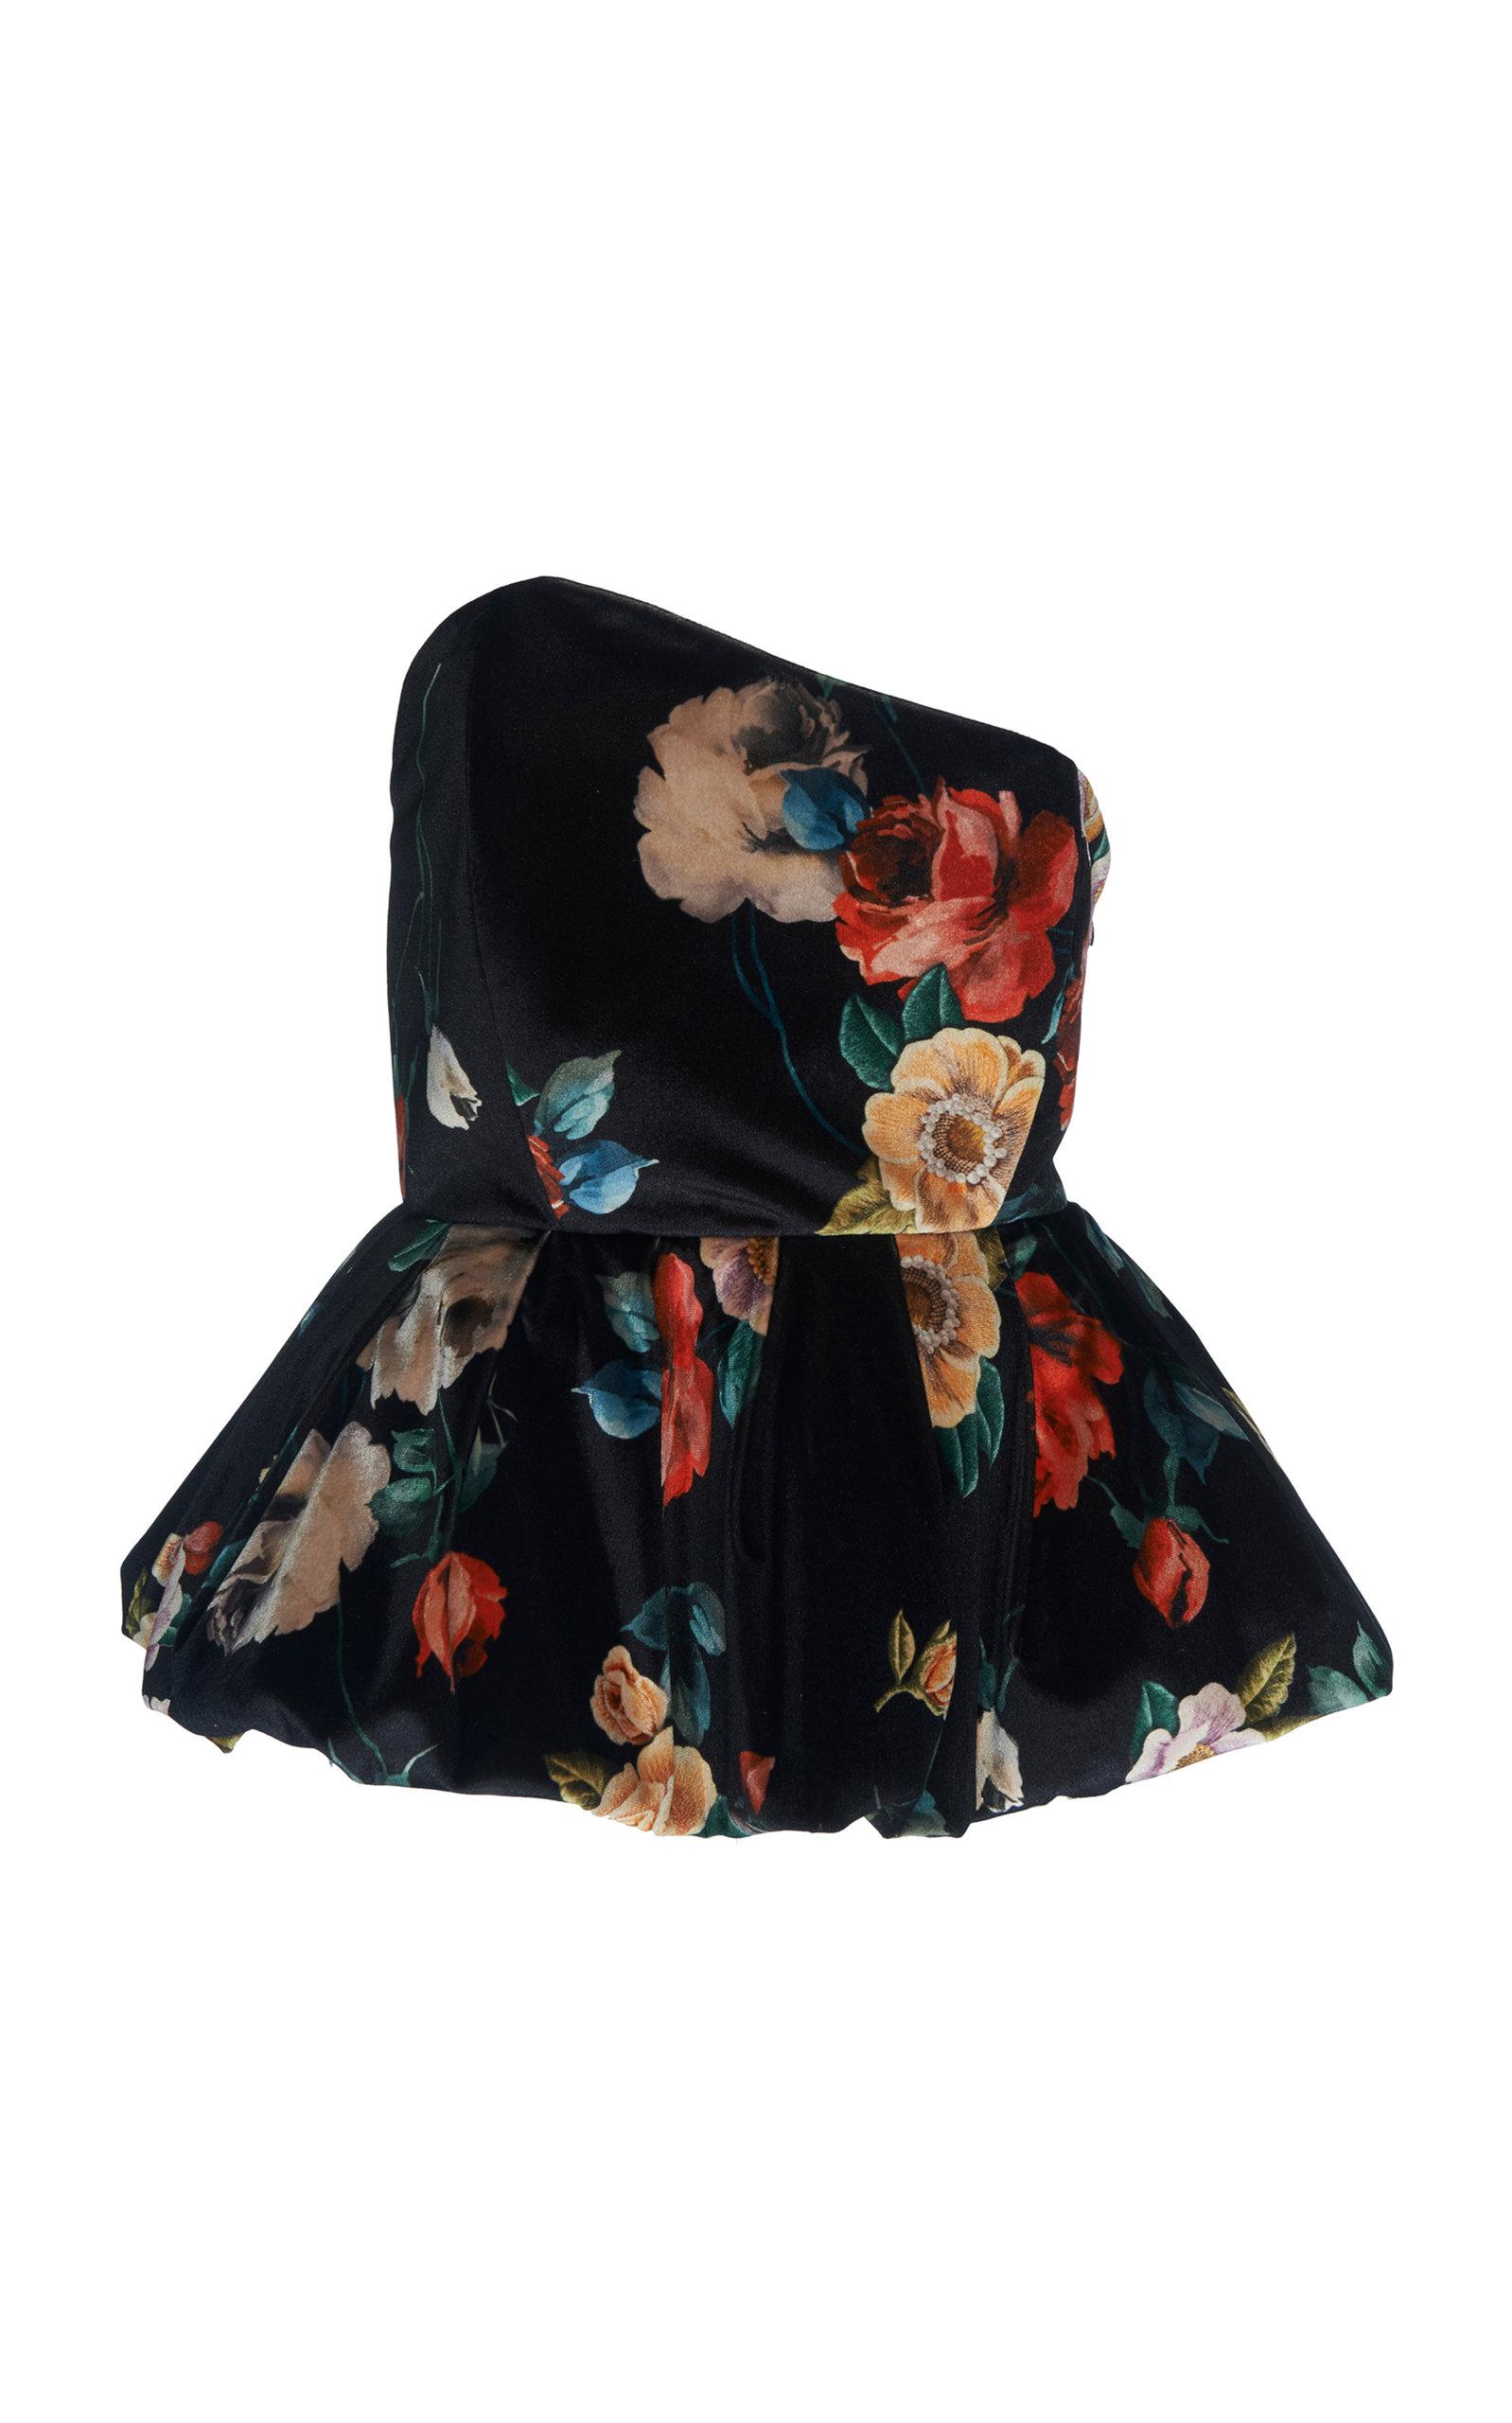 Asymmetric Floral-Print Velvet Peplum Top in Black